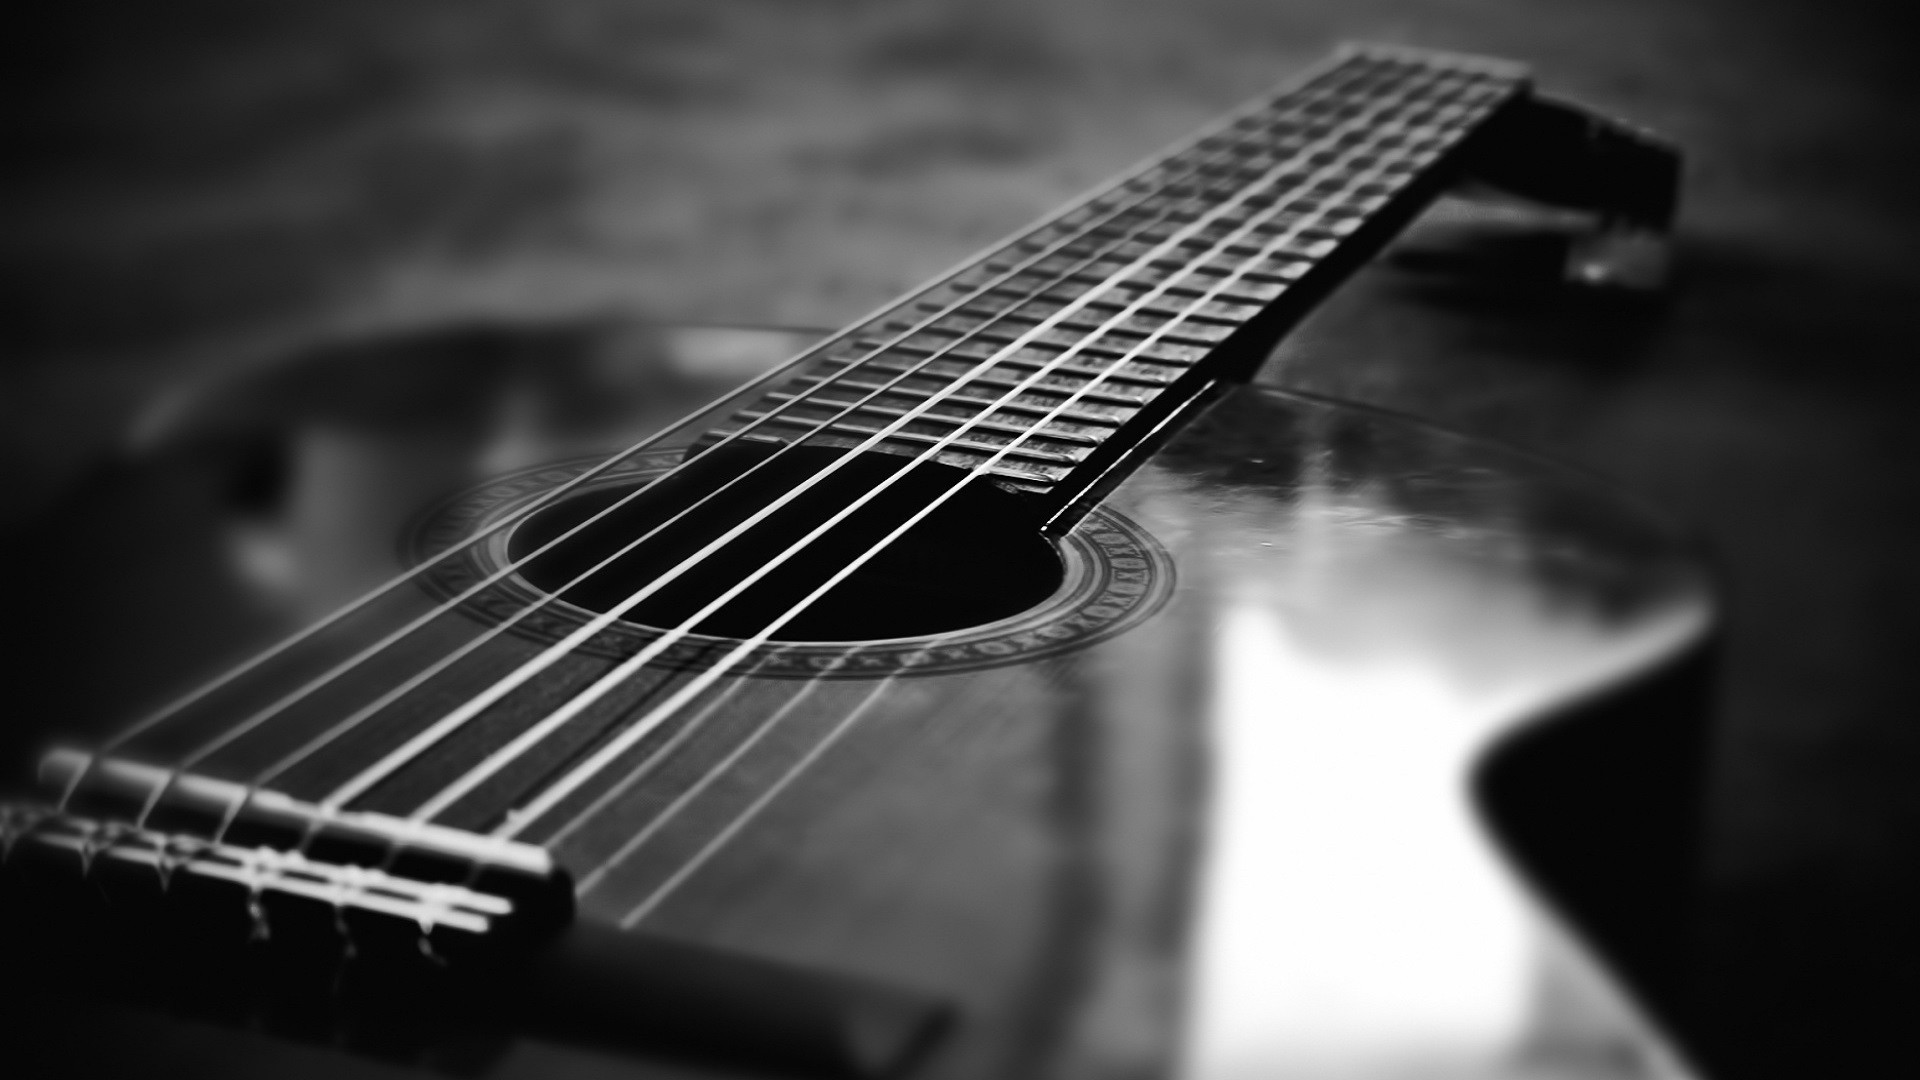 38 Prs Guitar Wallpaper Hd 1080p Hd Prs Guitar 1080p Black And White Guitar 1920x1080 Download Hd Wallpaper Wallpapertip